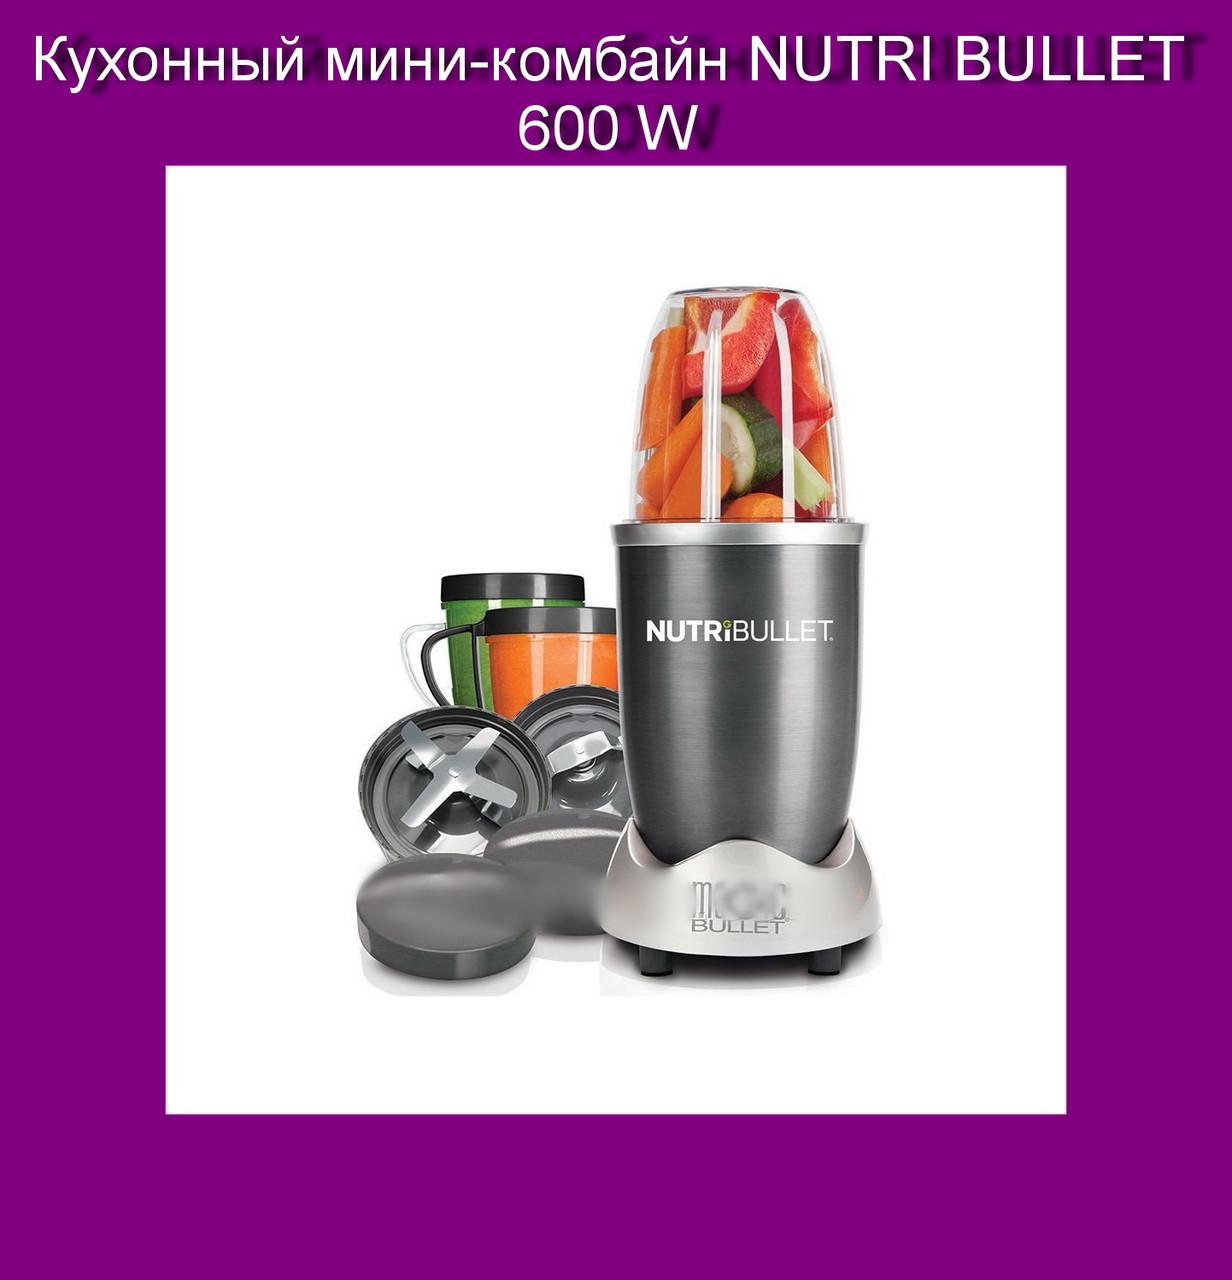 Кухонный мини-комбайн NUTRI BULLET 600 W!Акция